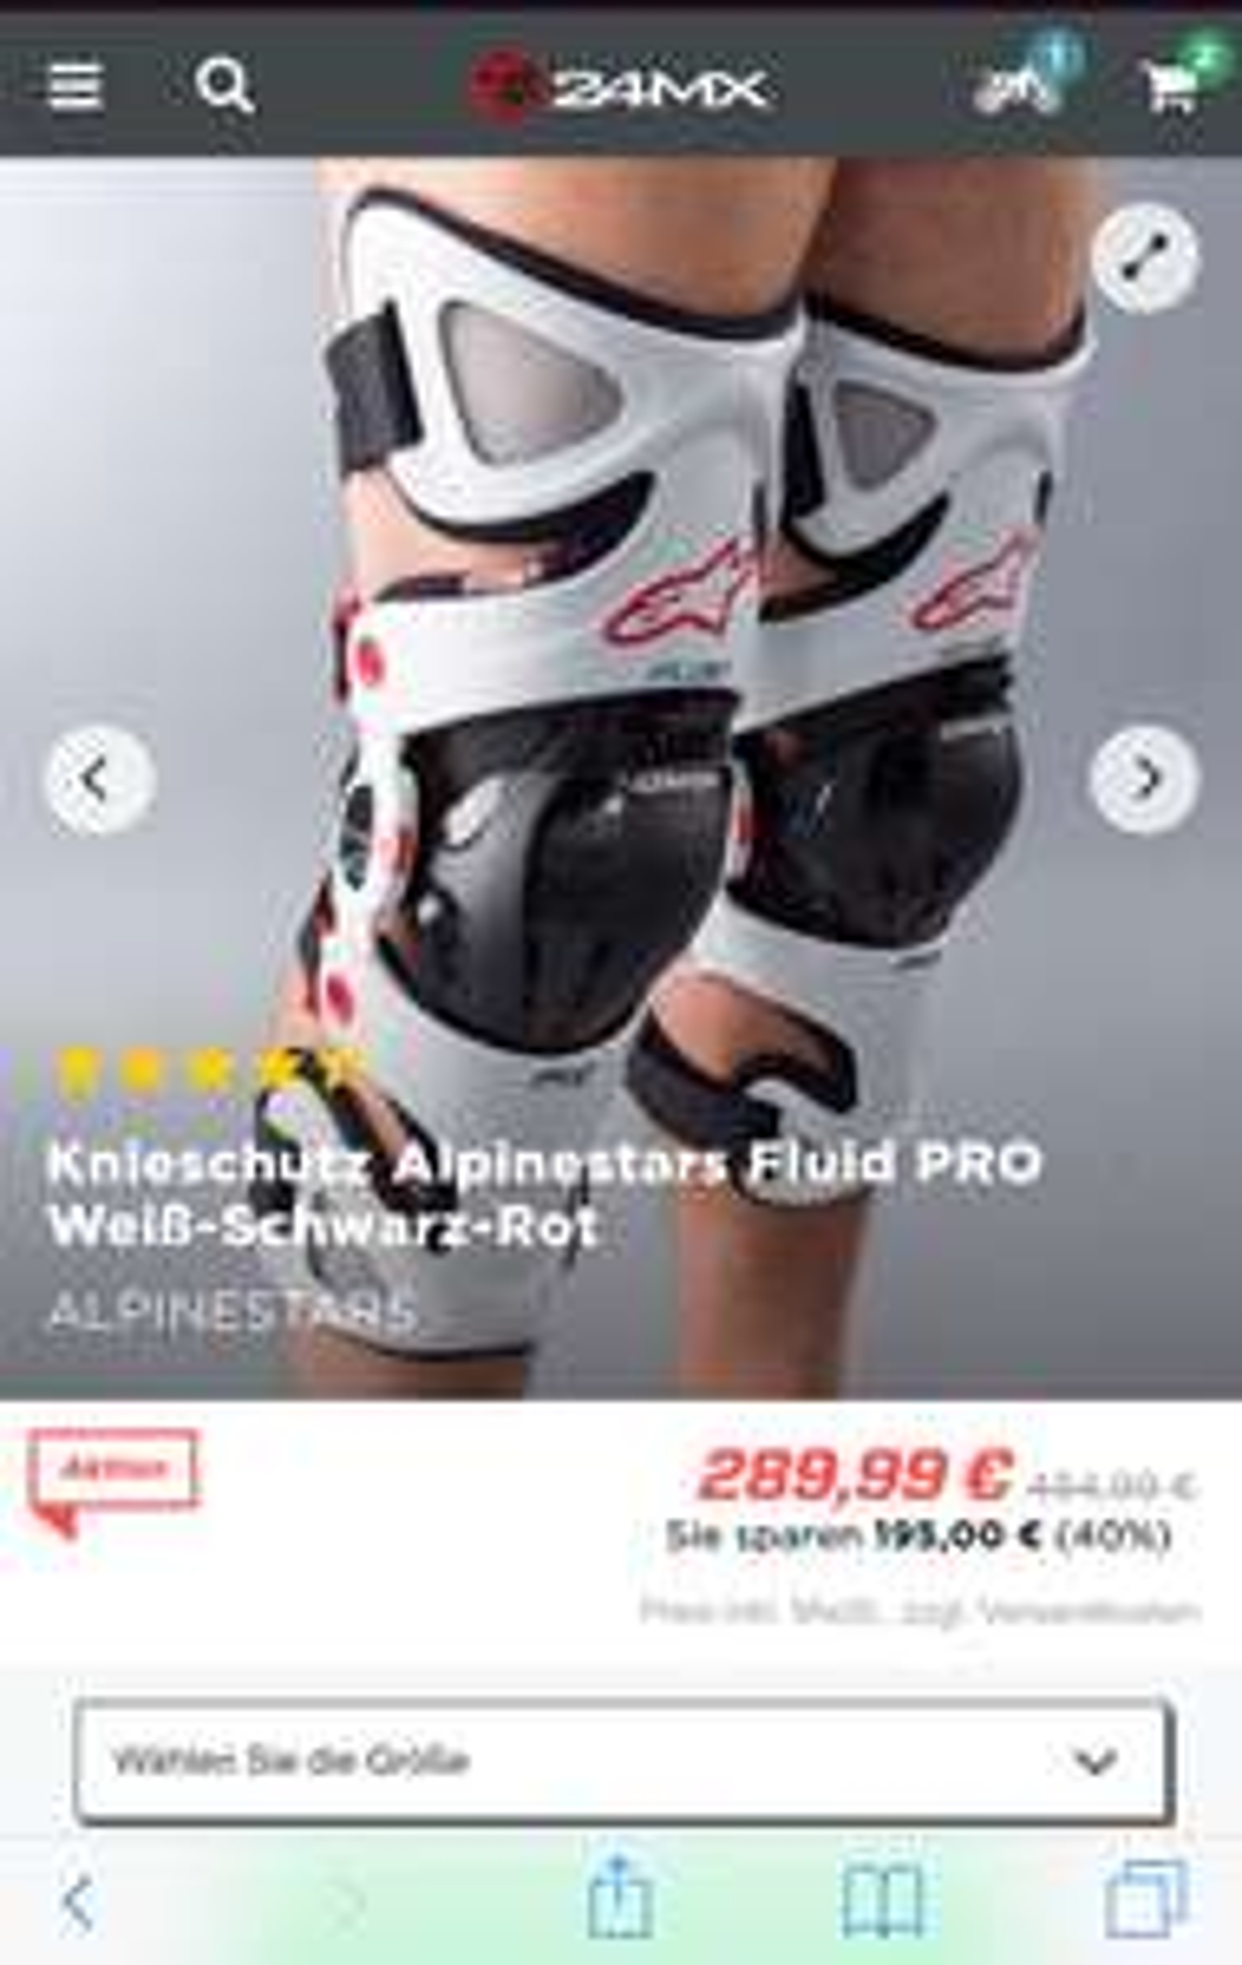 Alpinestars Fluid Pro heute im Angebot bei 24MX